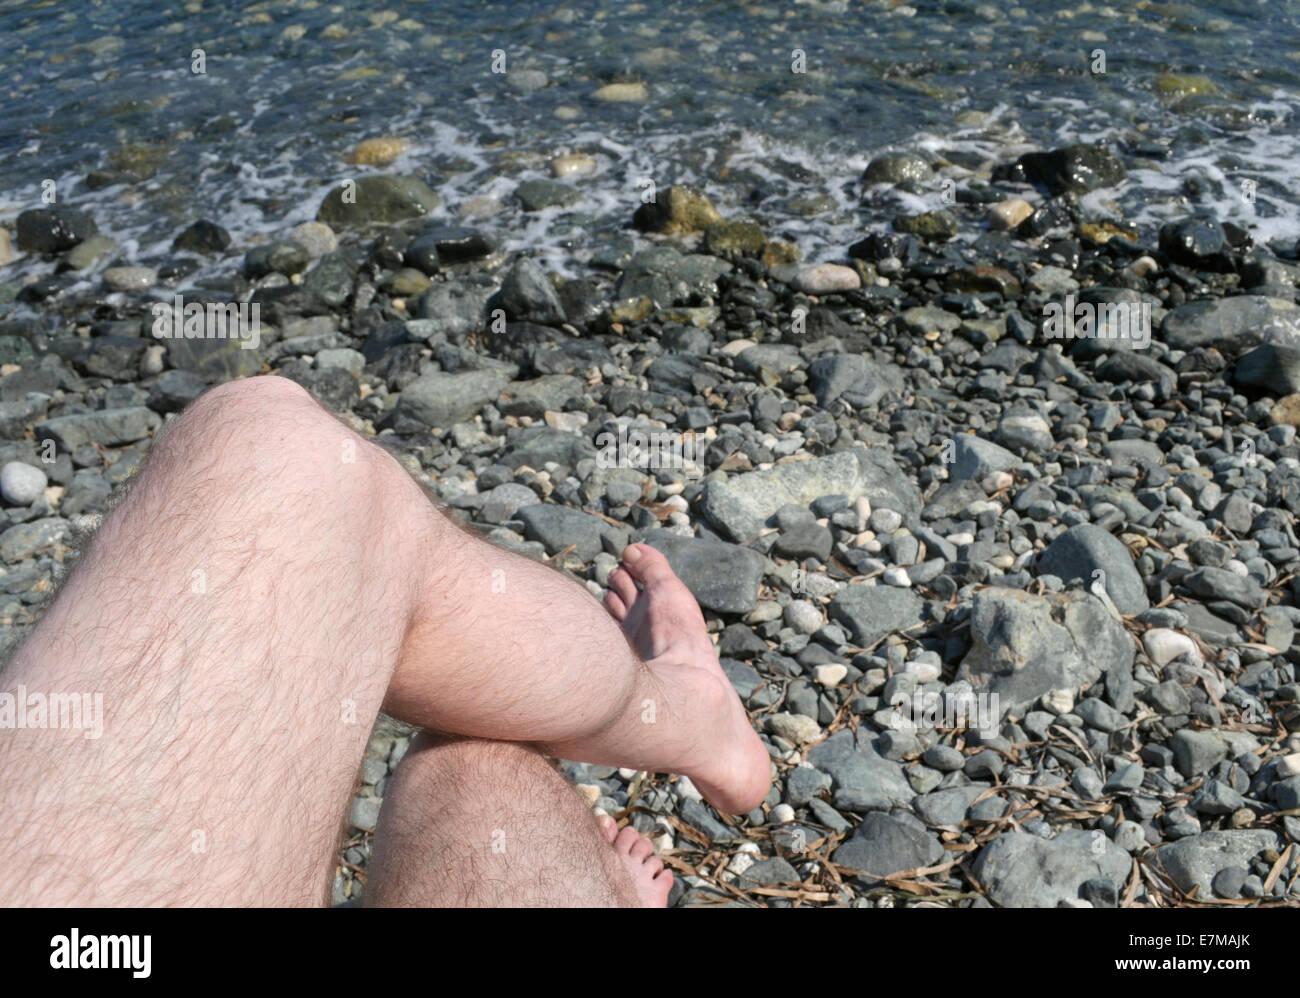 Crossed Legs Stock Photos & Crossed Legs Stock Images - Alamy